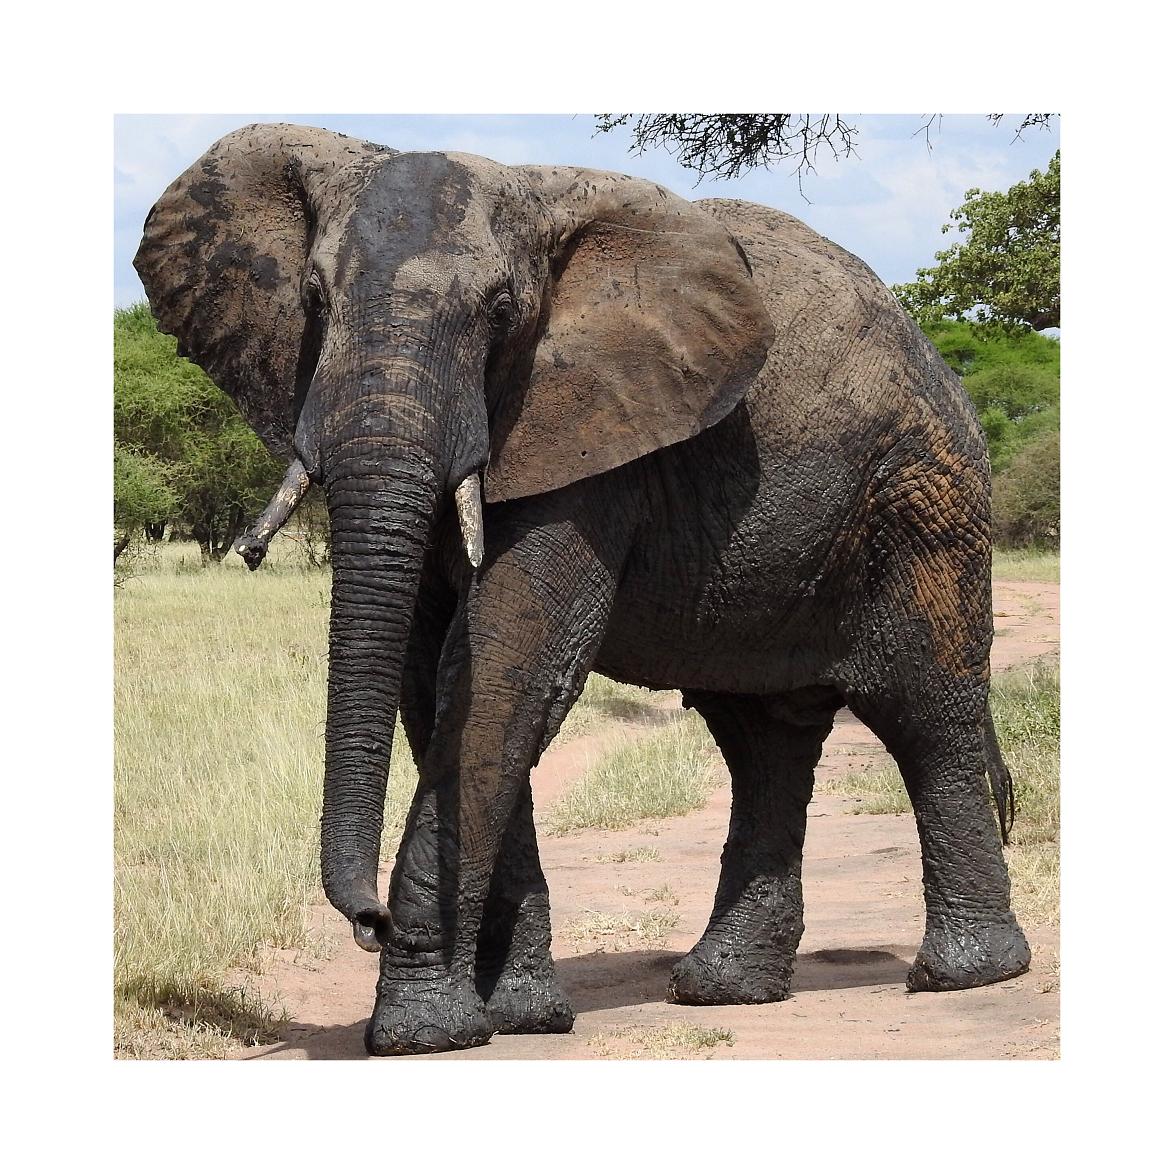 Elephant in Kuro' Tarangire National Park